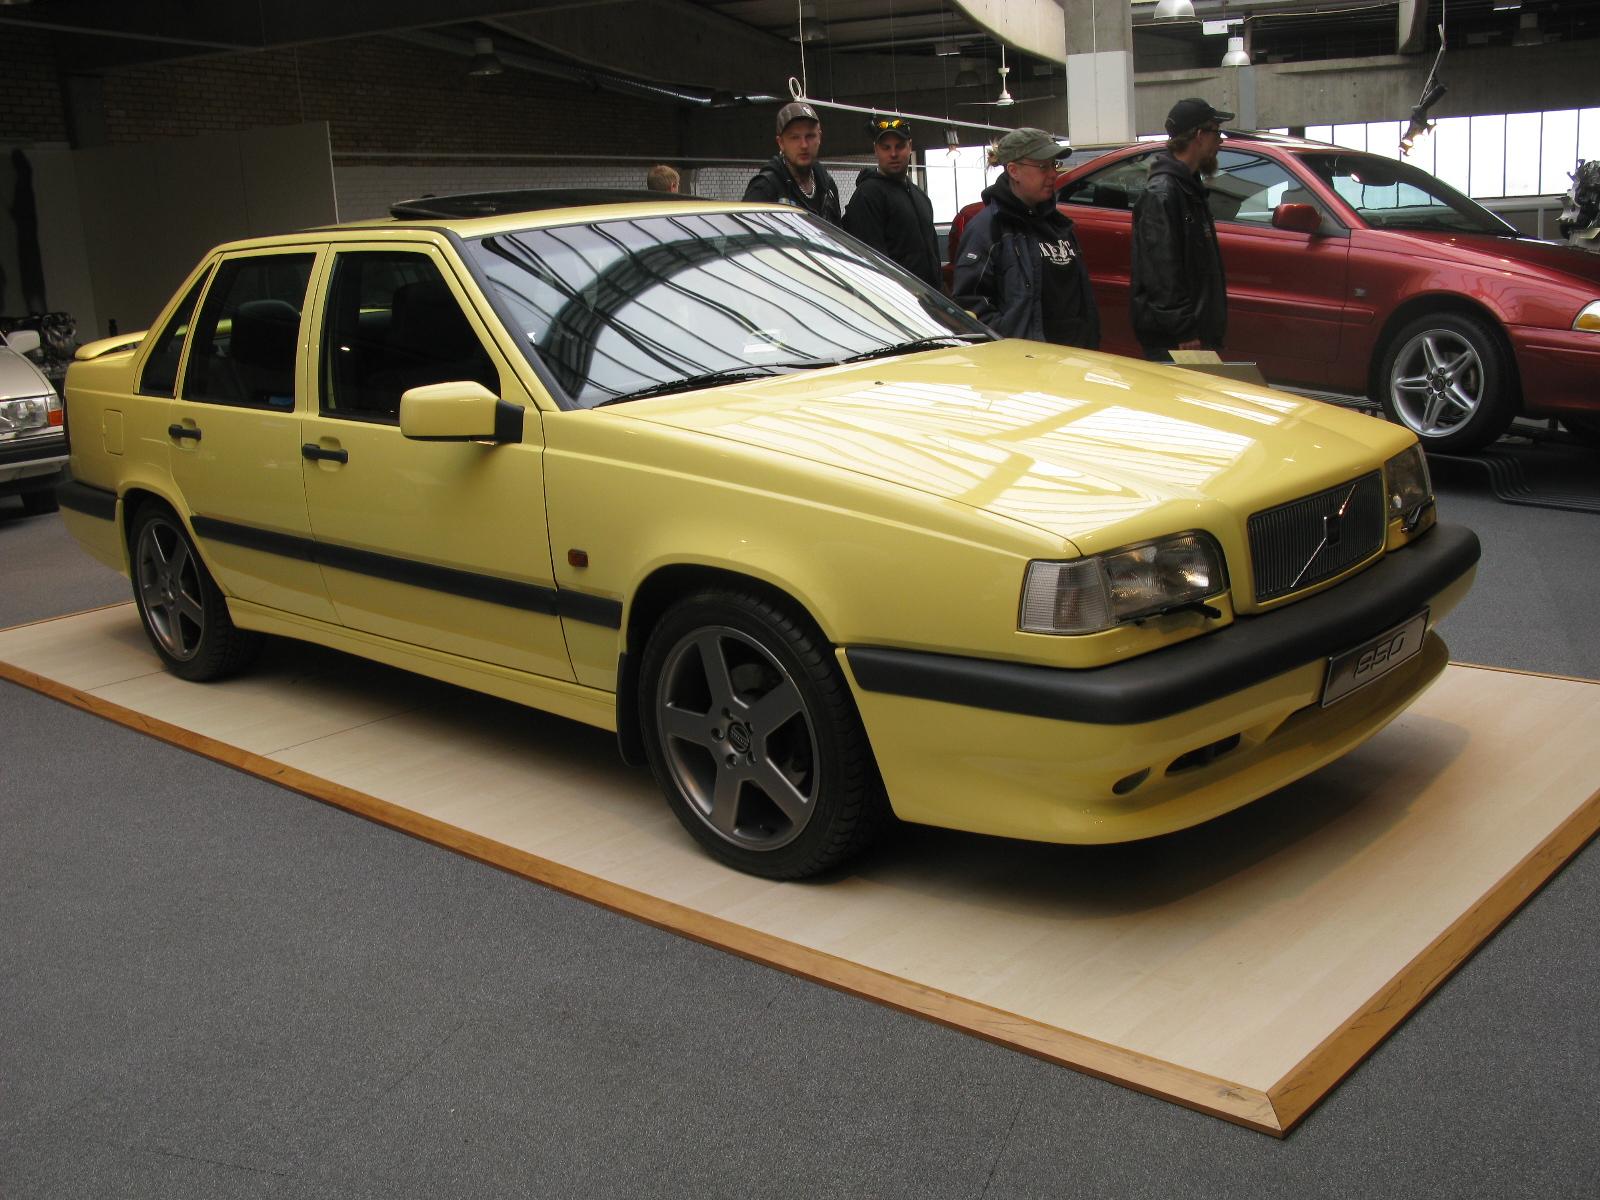 File:Volvo 850 T5R (15191897832).jpg - Wikimedia Commons